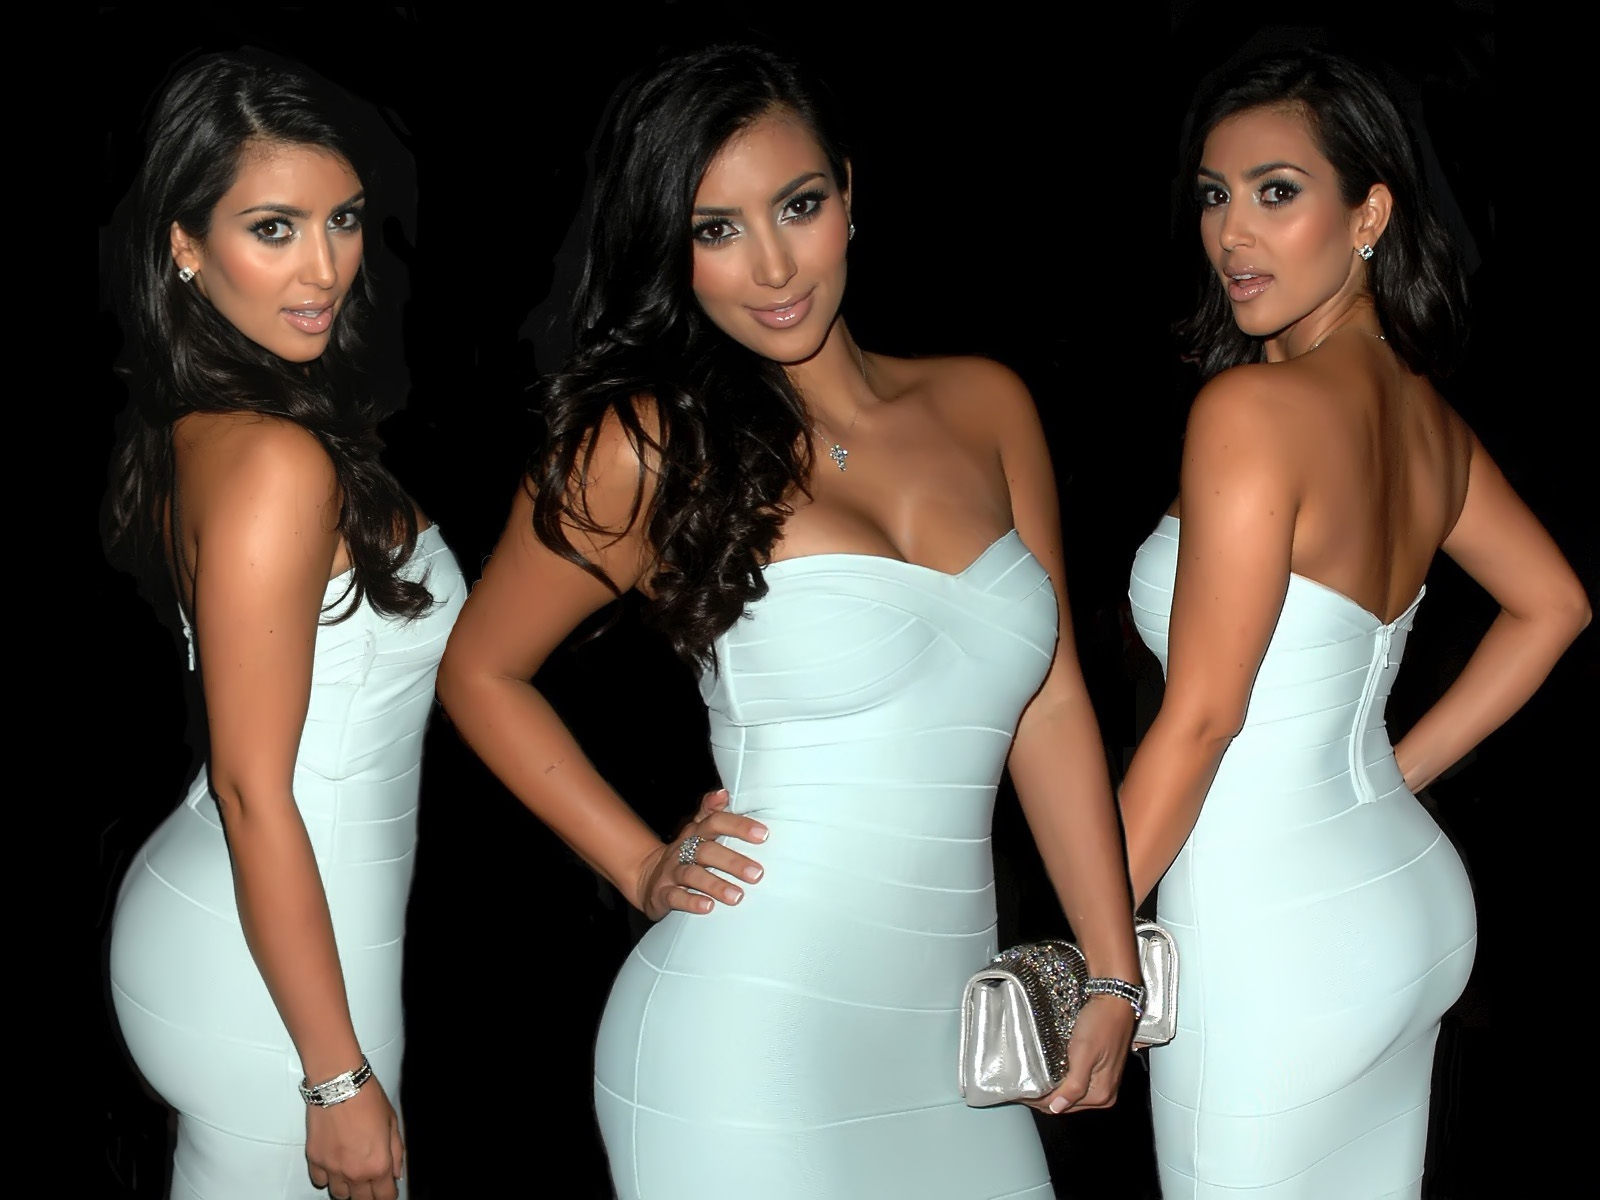 http://2.bp.blogspot.com/-GHn3aFVLGlU/TyvkFgz0hWI/AAAAAAAADDU/VG4s0DjvIDs/s1600/Kim-Kardashian-Wallpapers-HD-1.jpg